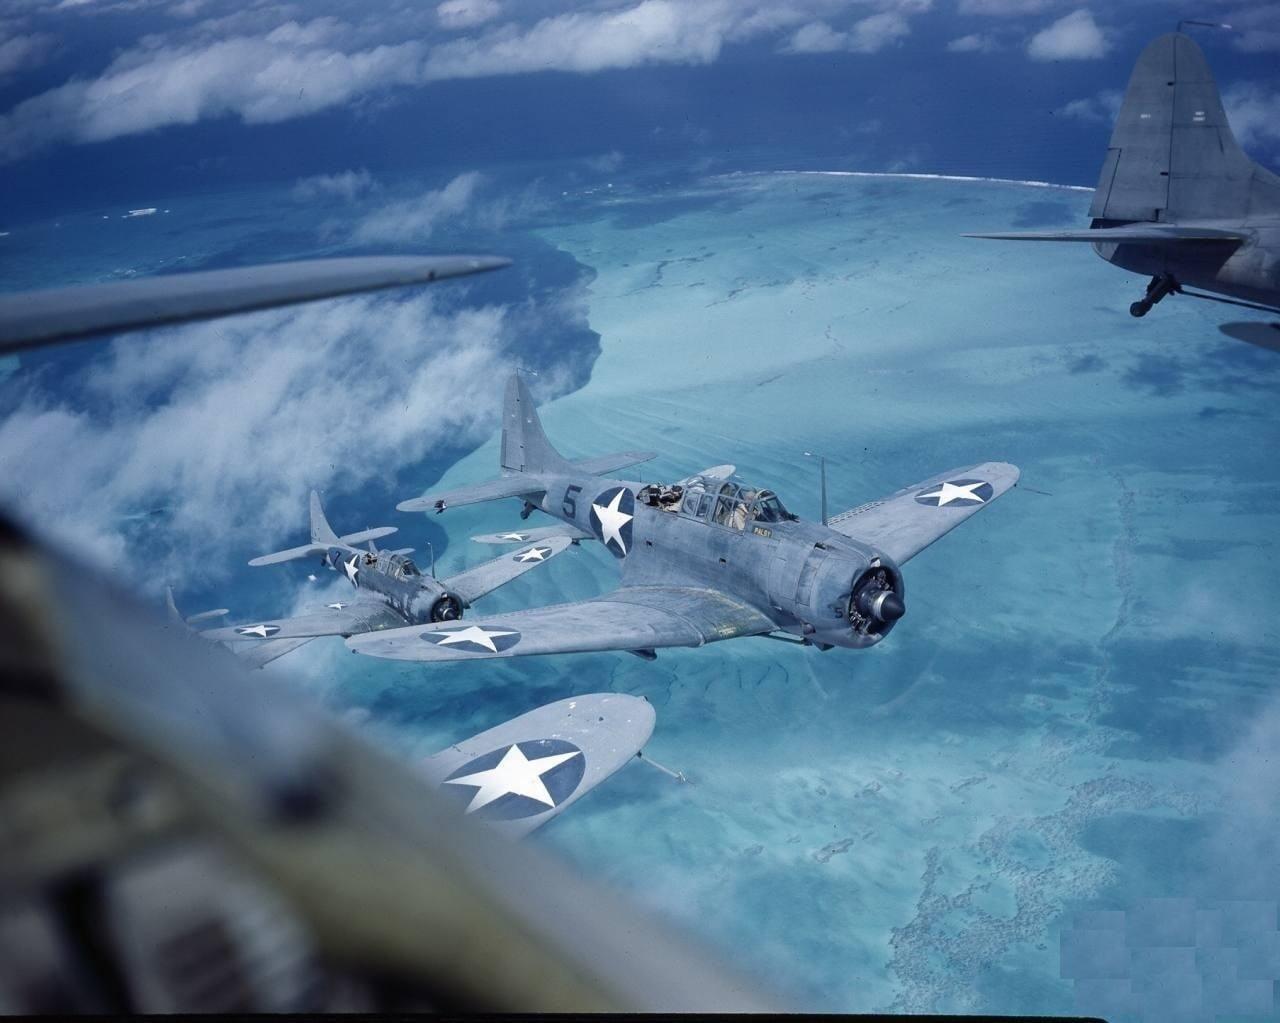 Gray plane artwork painting airplane Douglas SBD Dauntless HD 1280x1023